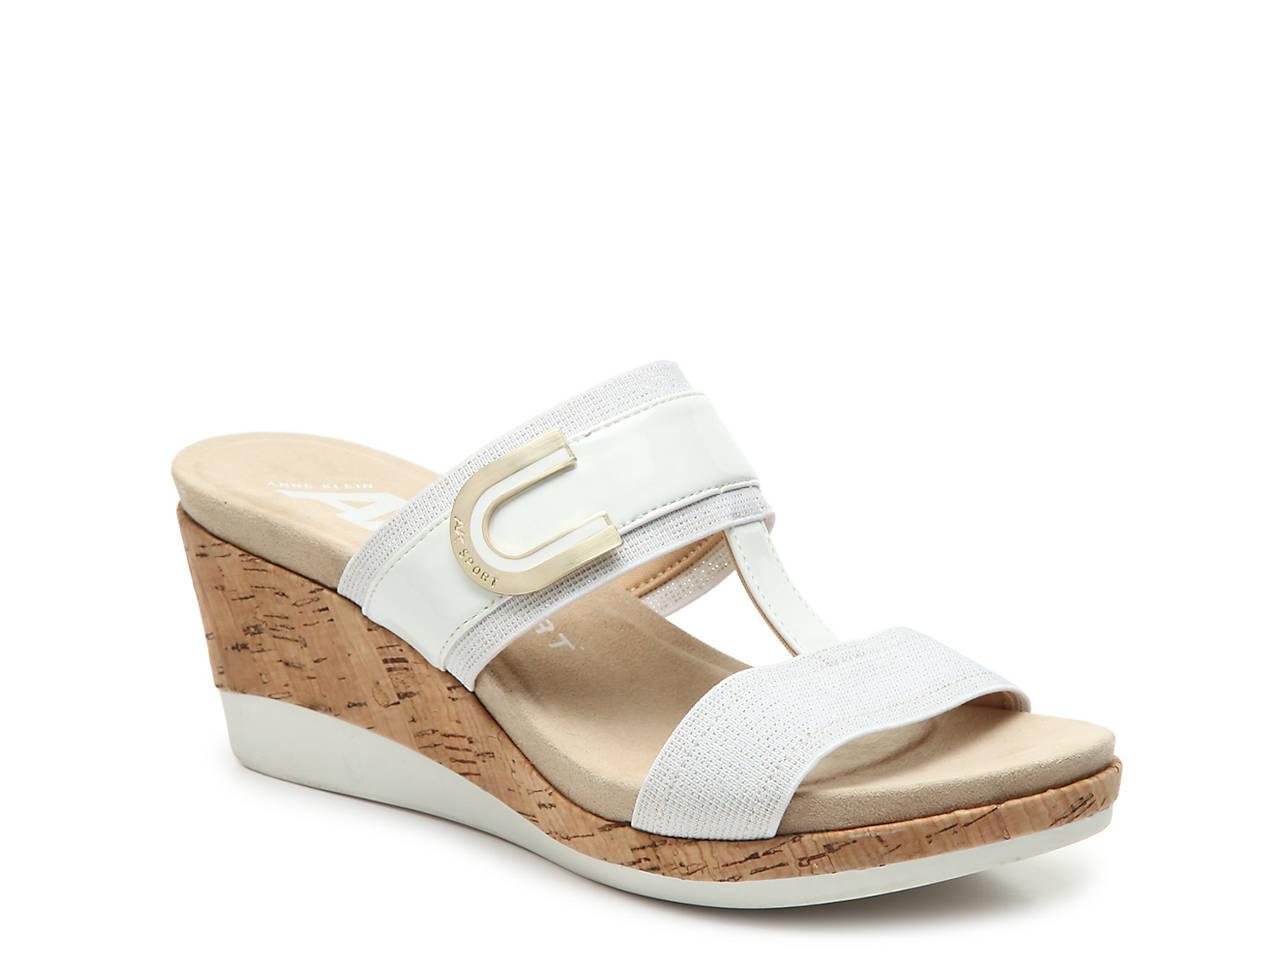 f735bd75987 Anne Klein Sport Pax Wedge Sandal Women s Shoes